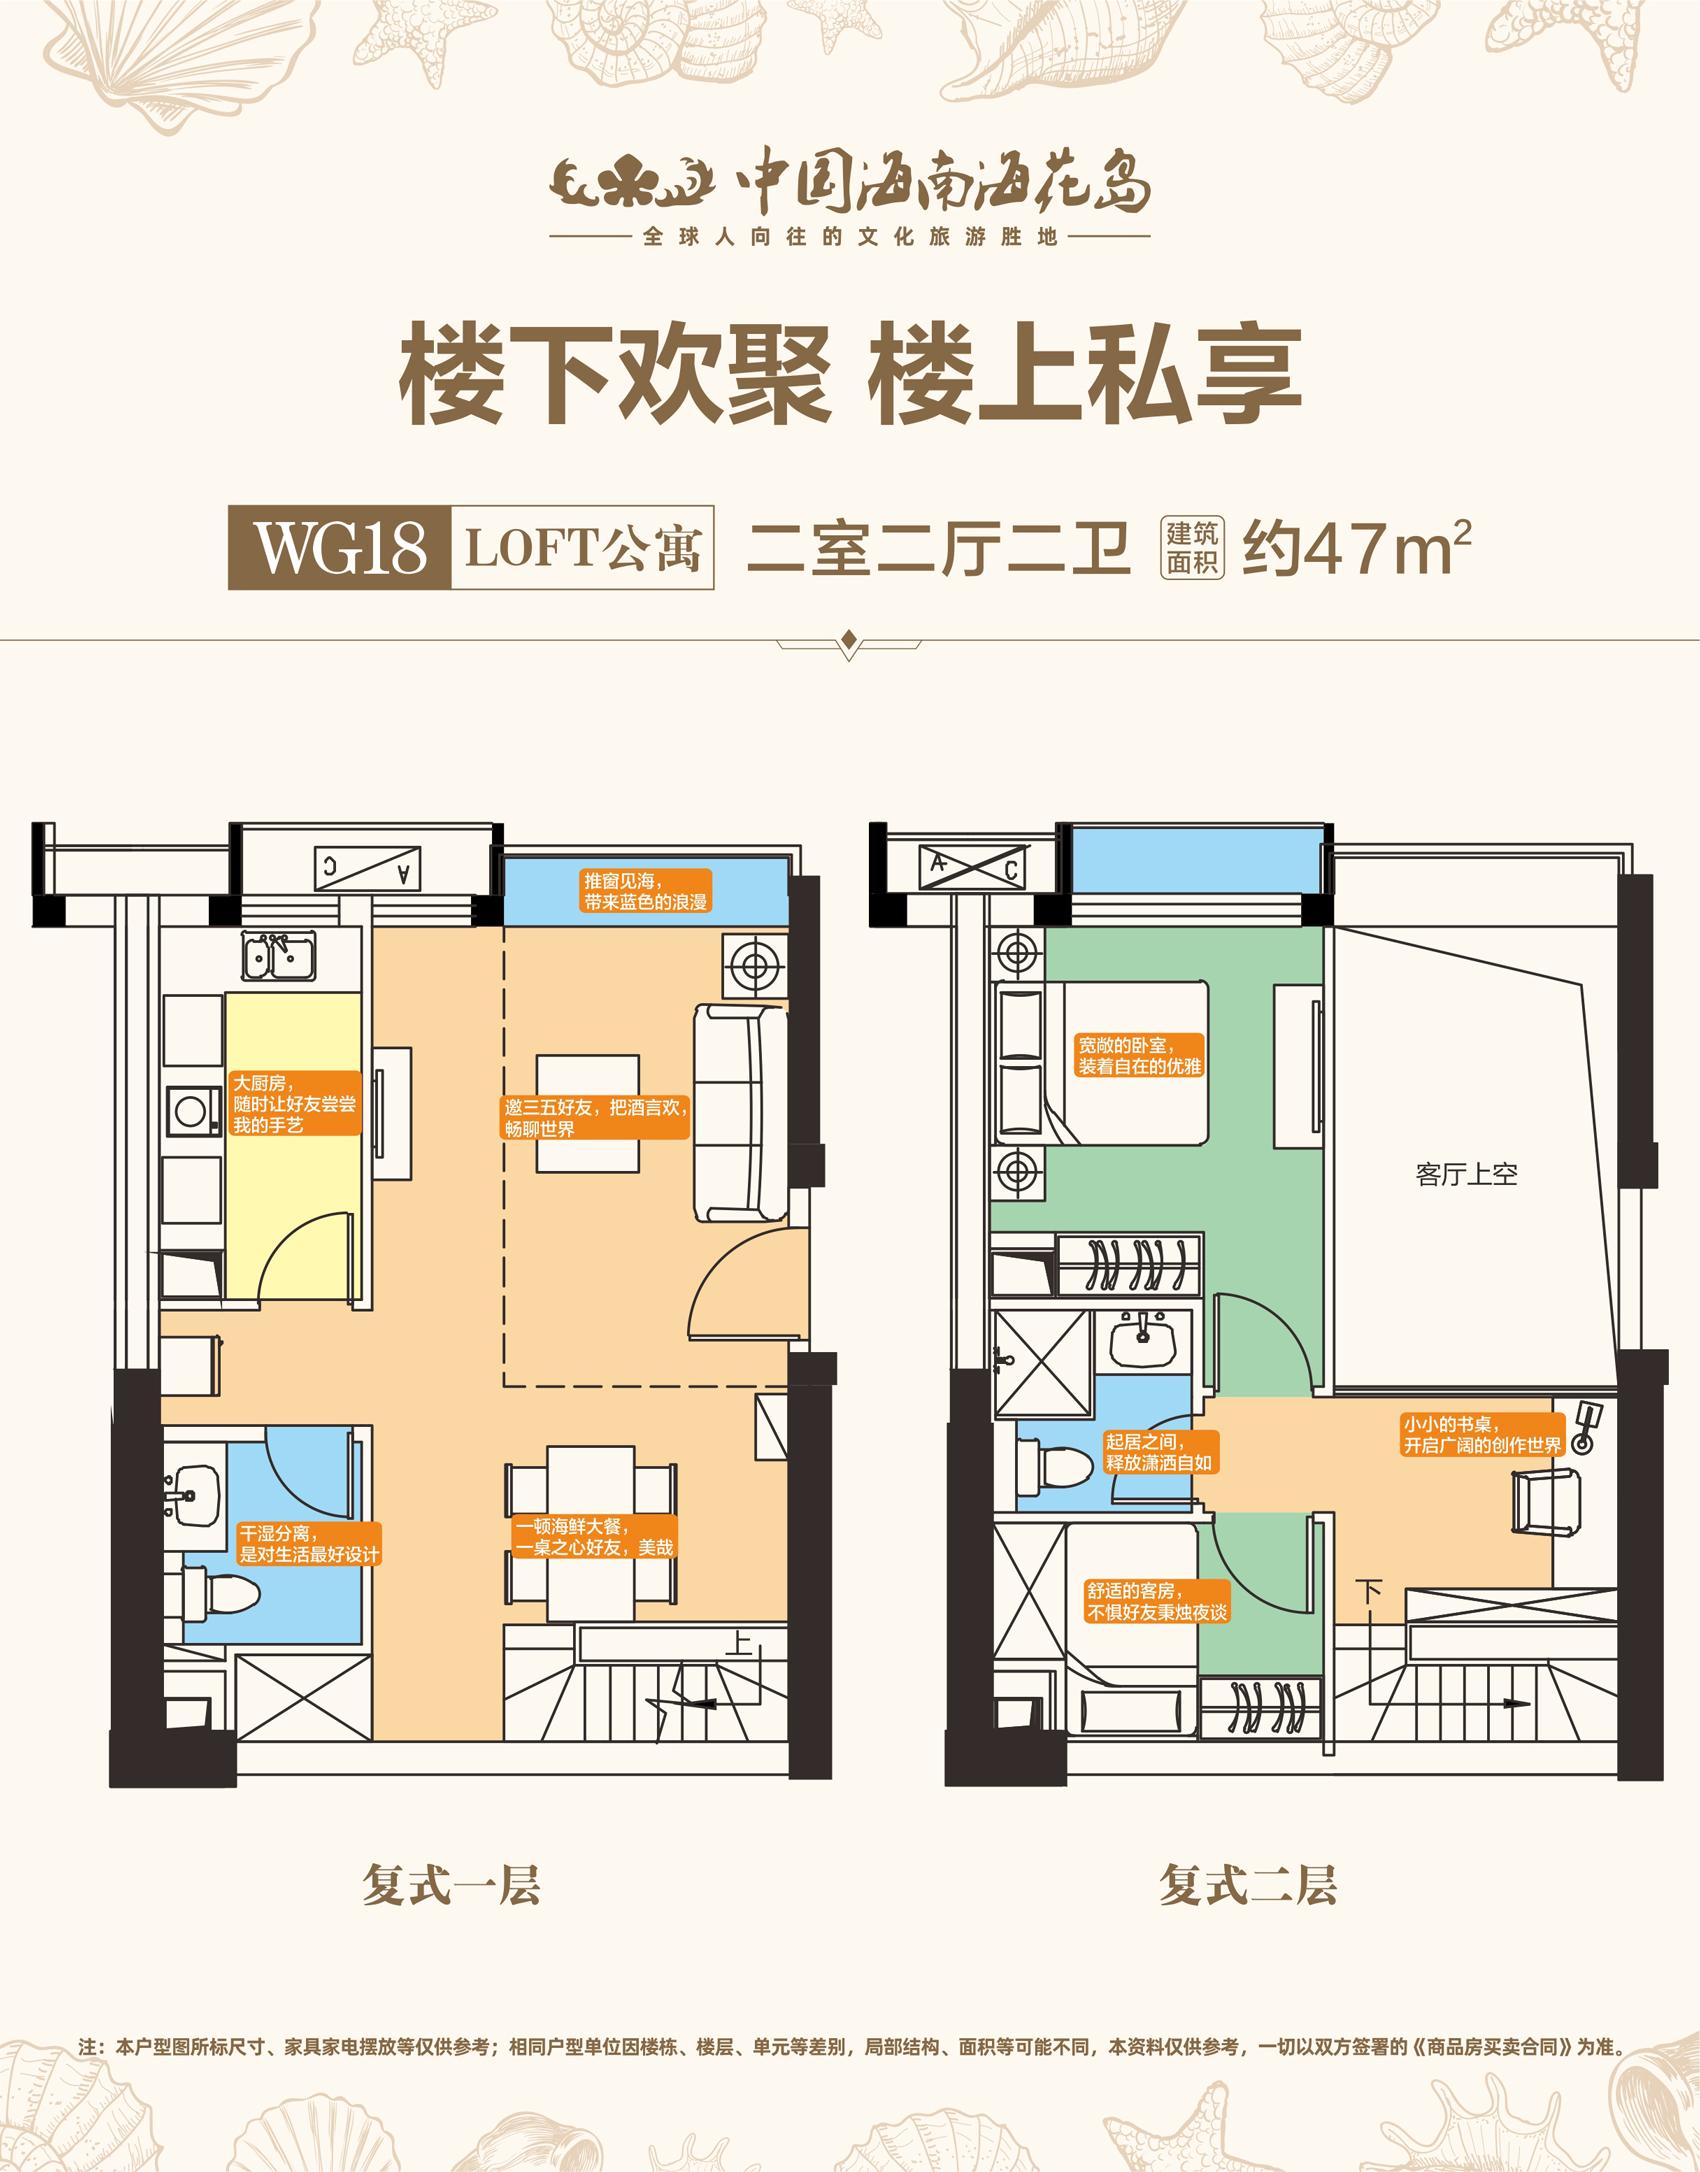 WG18LOFT公寓 2室2厅2卫 建面约47㎡